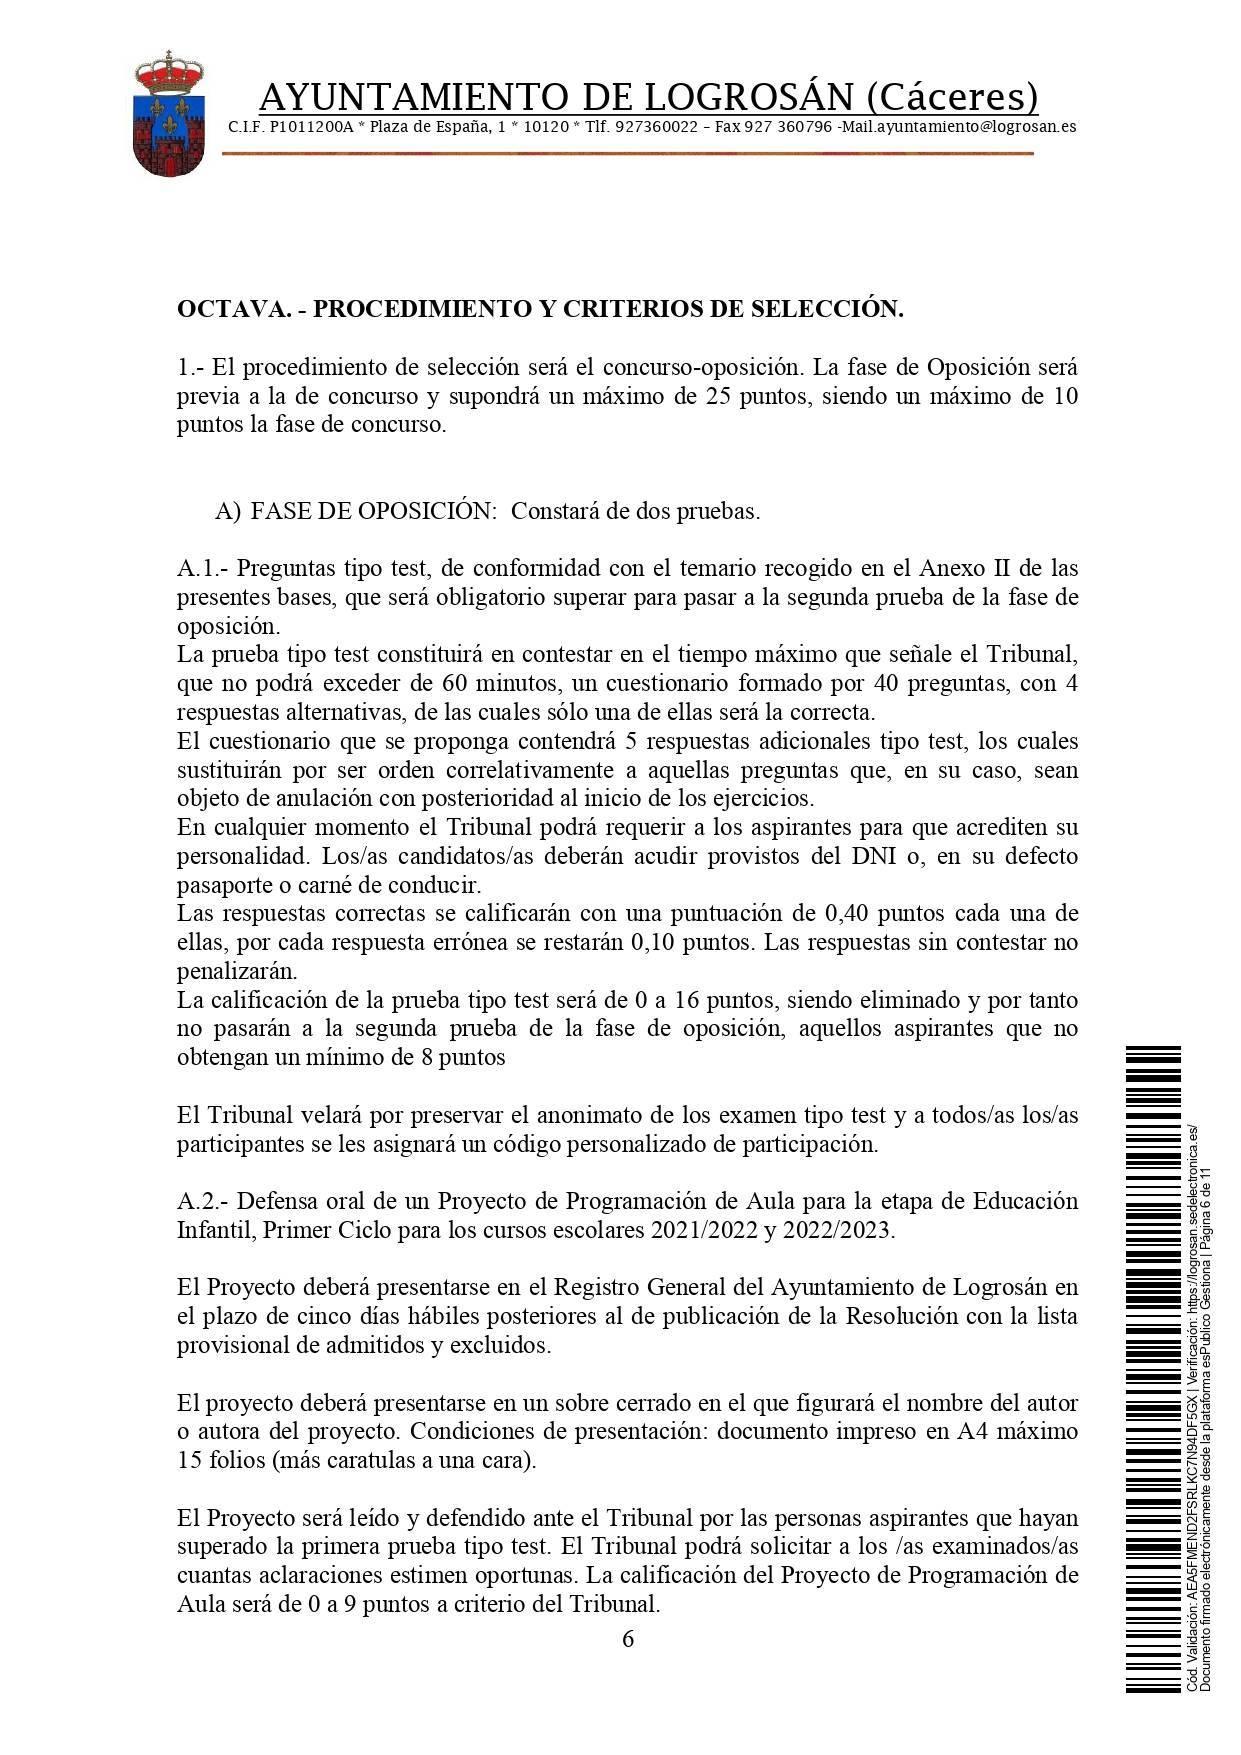 Bolsa de técnicos-as en educación infantil (2021) - Logrosán (Cáceres) 6